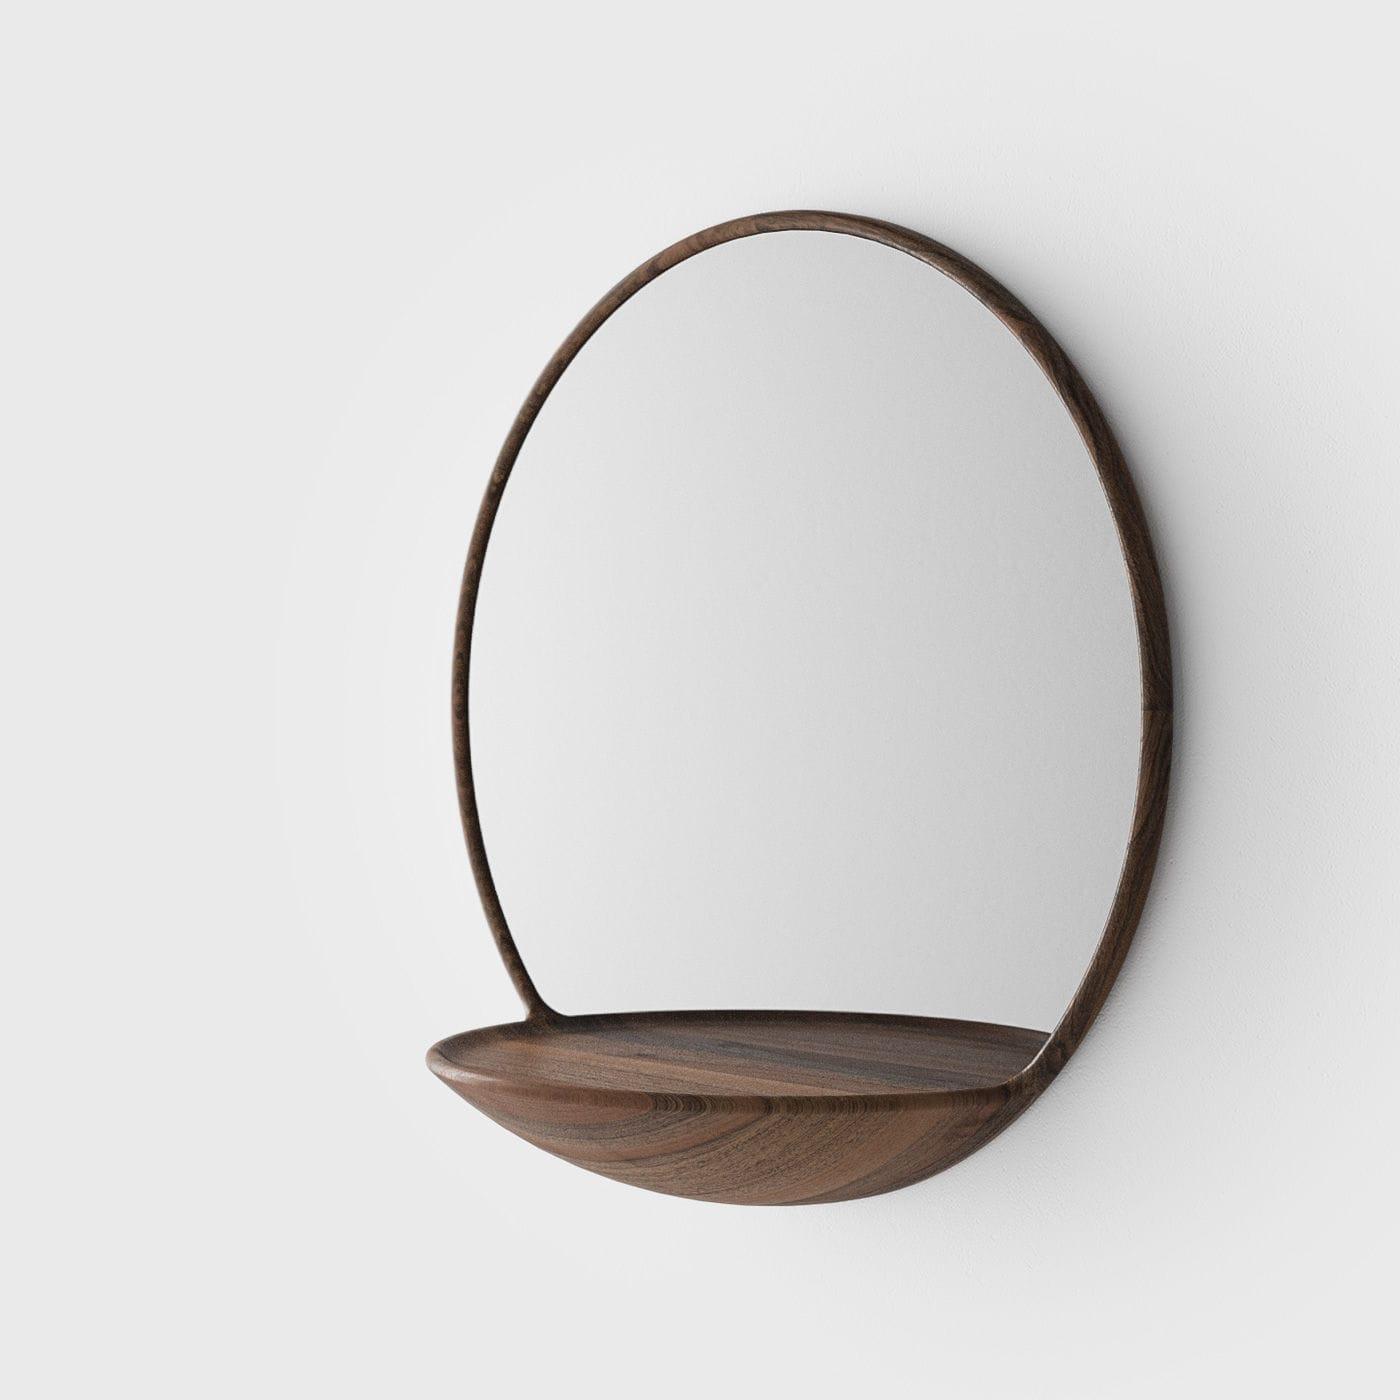 Top Wandmontierter Spiegel / modern / oval / mit Regal - KALOTA by  YP11